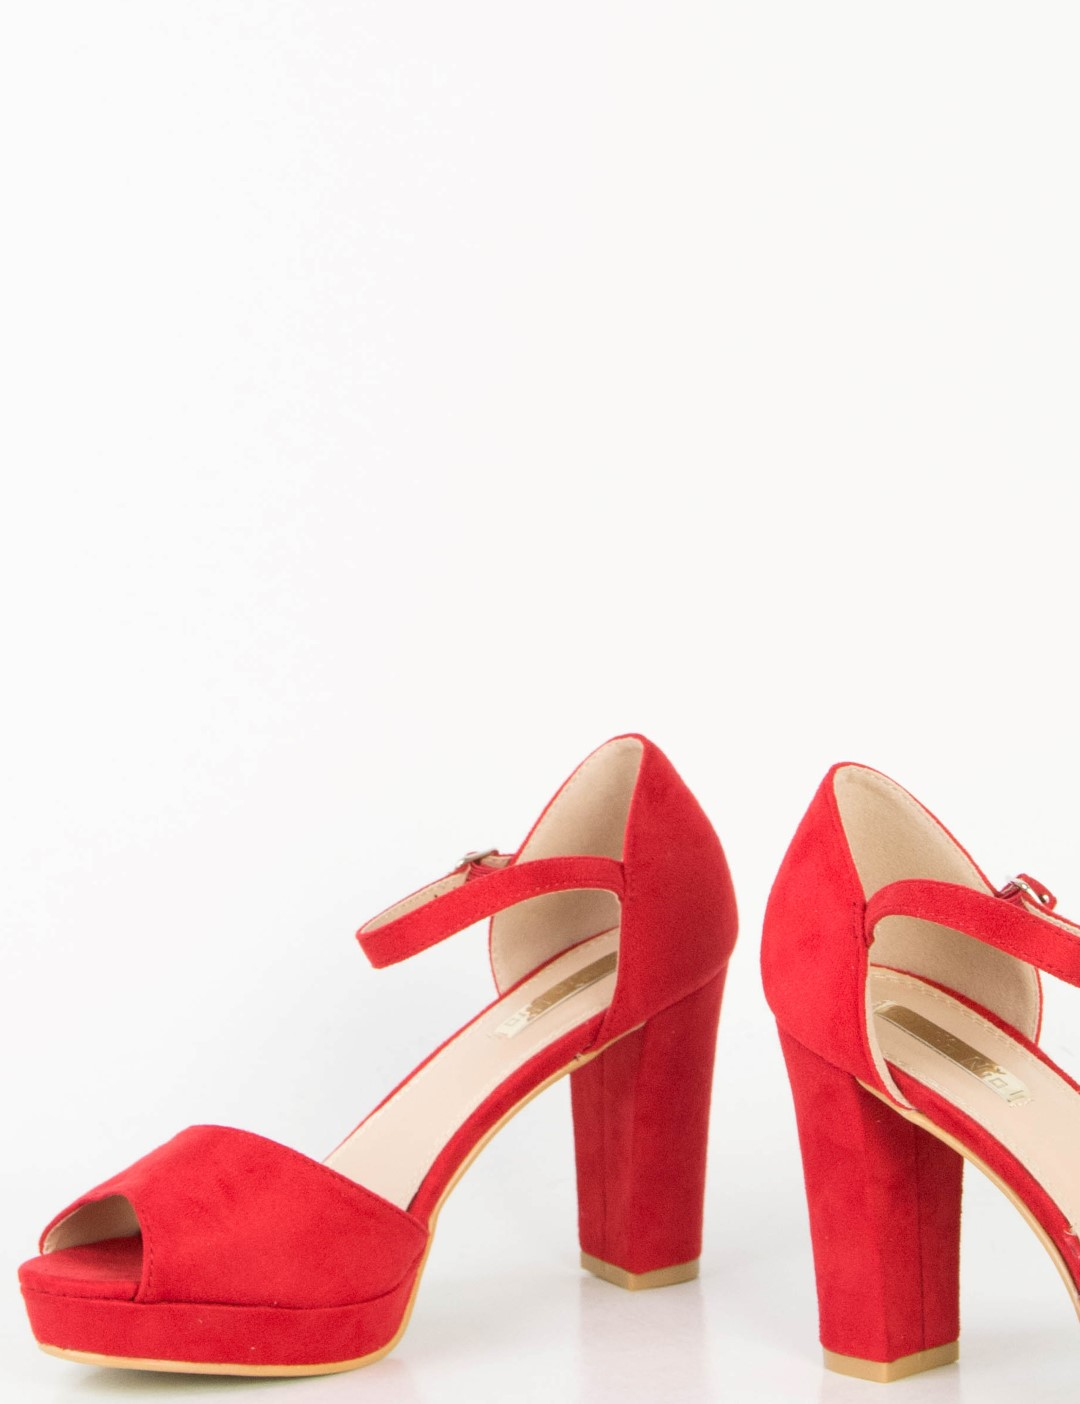 a55d7e15e3b Γυναικεία κόκκινα σουέντ πέδιλα χοντρό τακούνι 8116Y